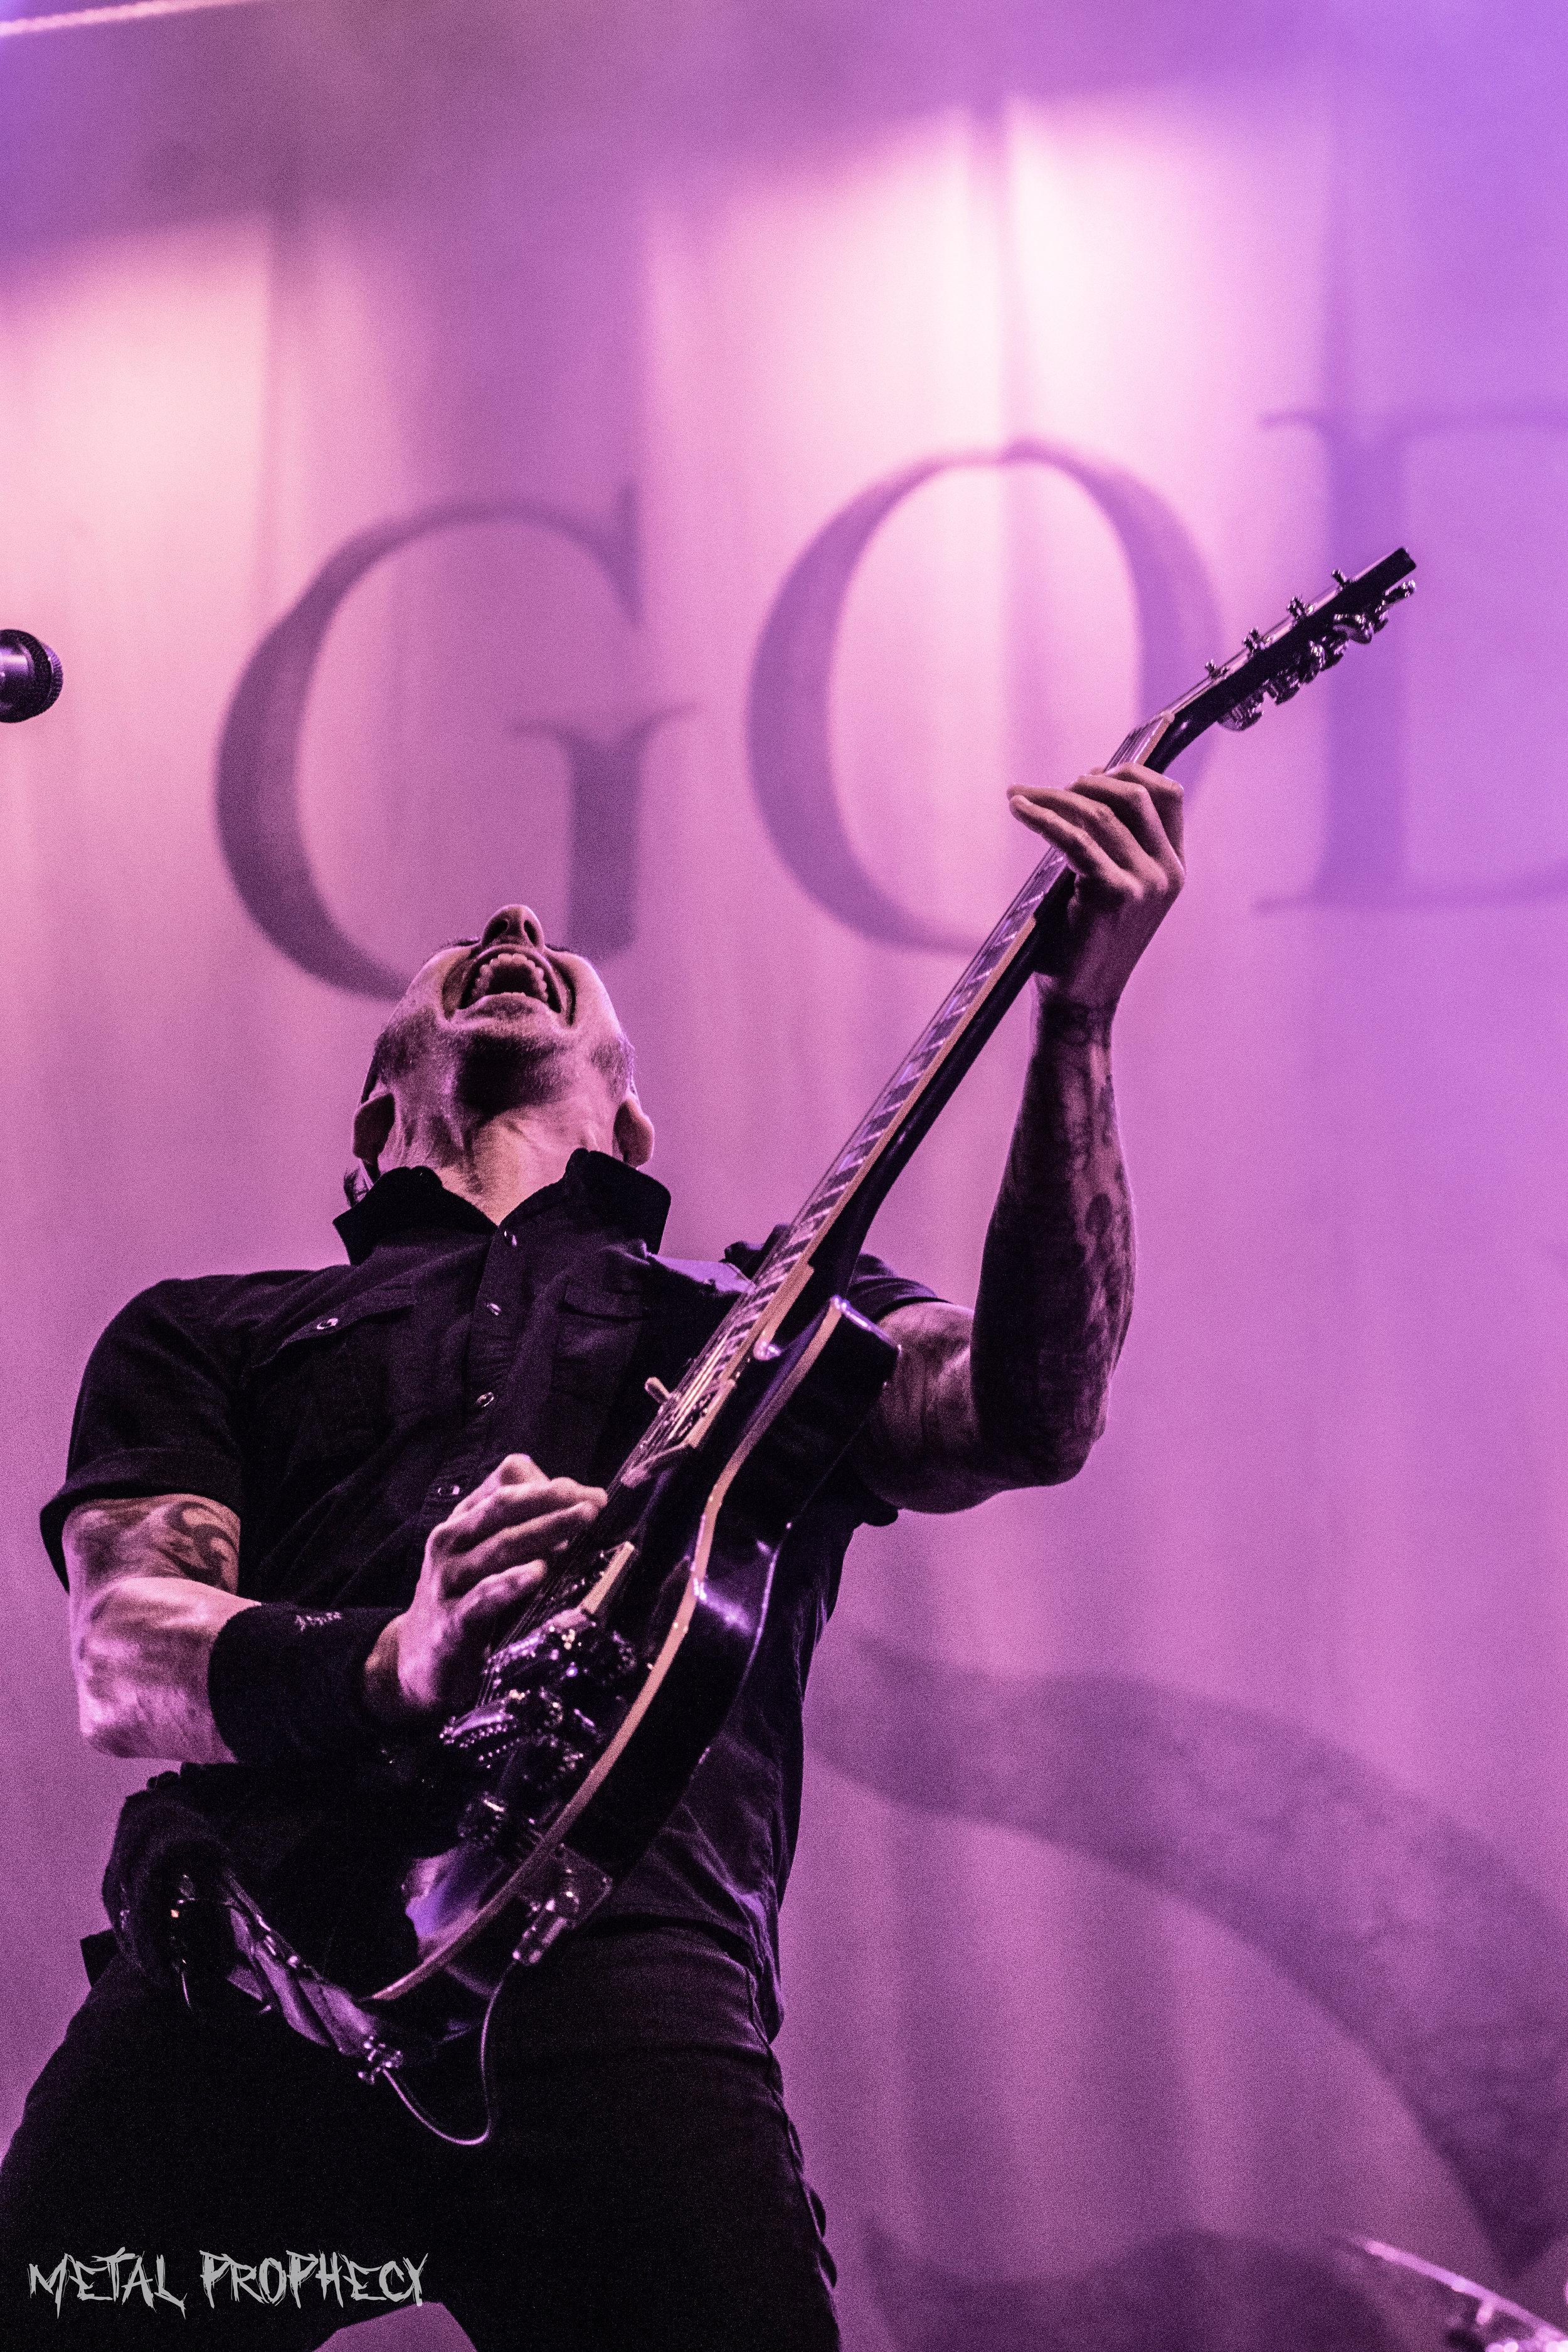 Godsmack at Ameris Bank Amphitheater